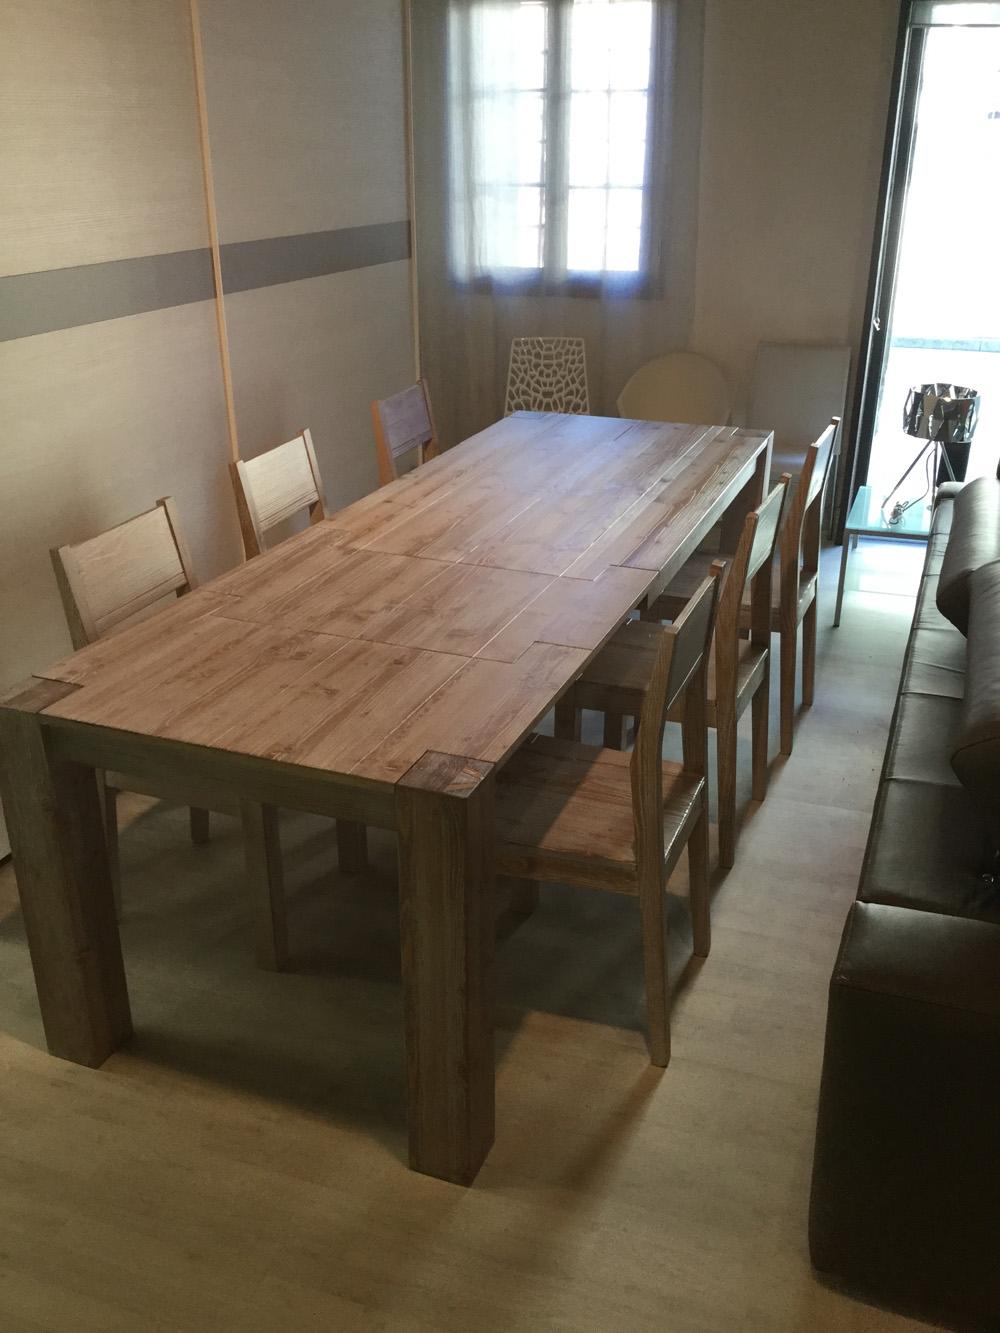 Emejing tavoli in legno allungabili ideas for Tavoli estensibili